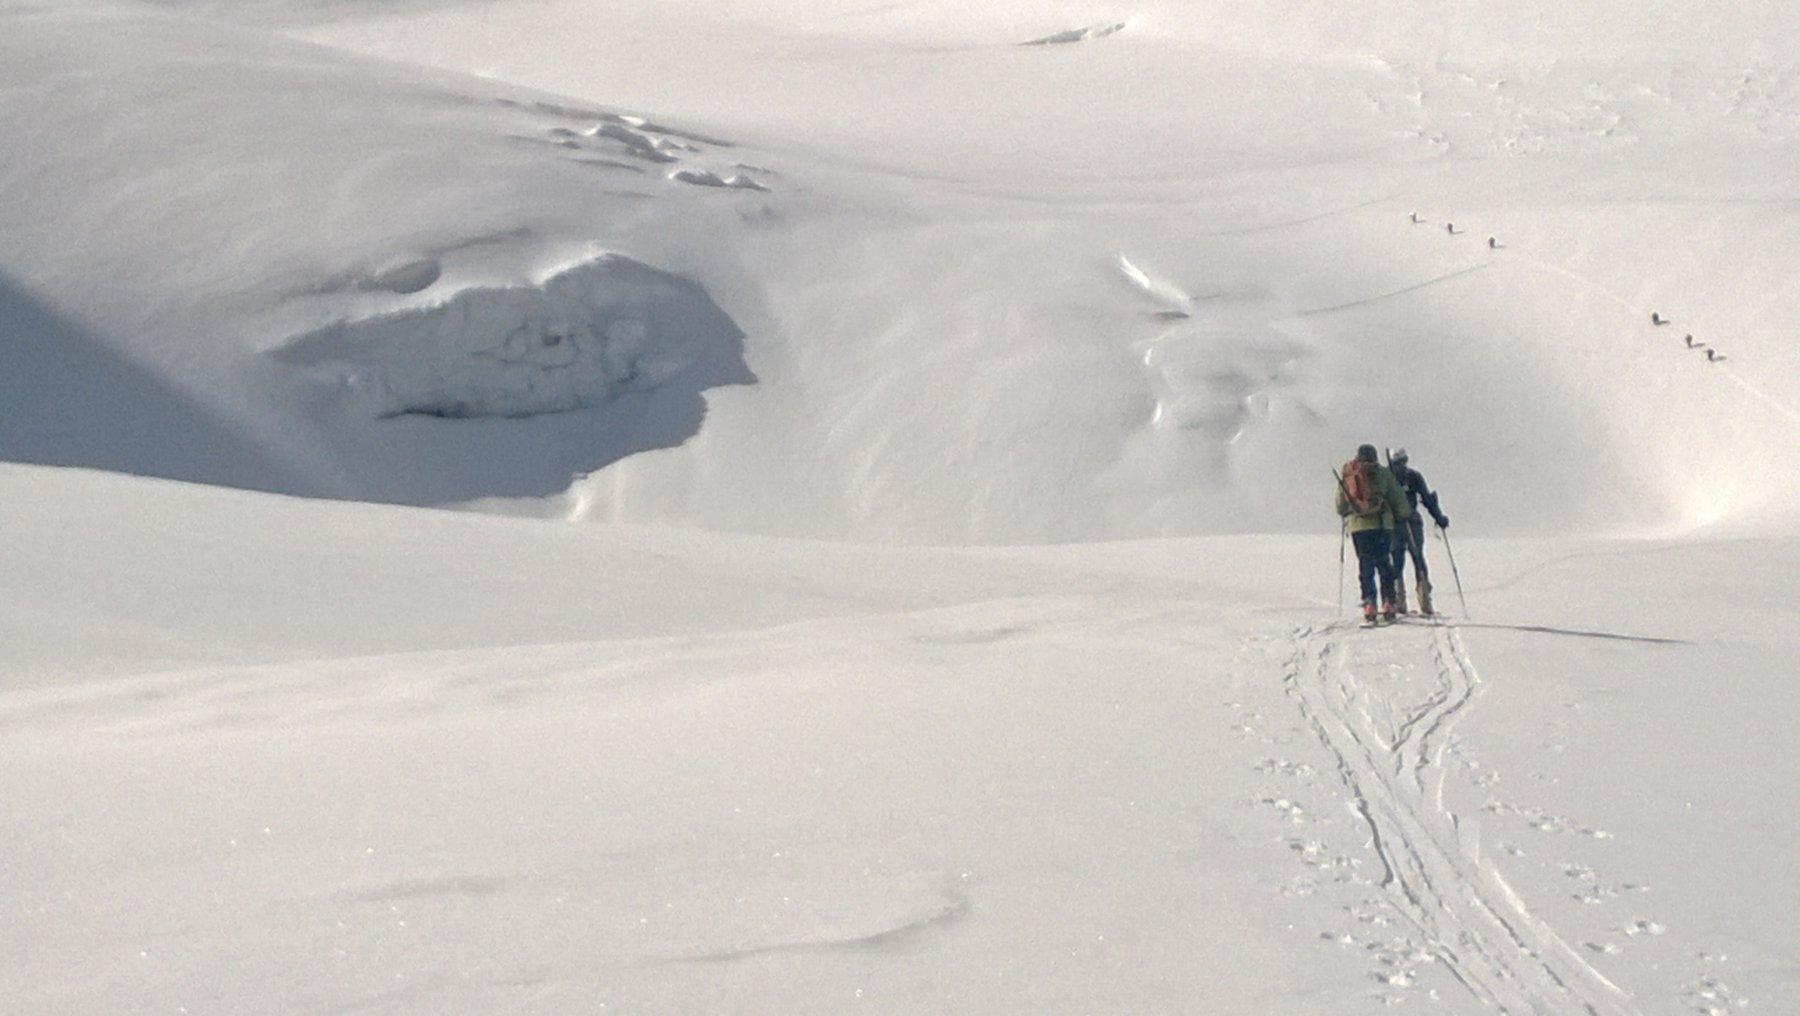 Sul ghiacciaio